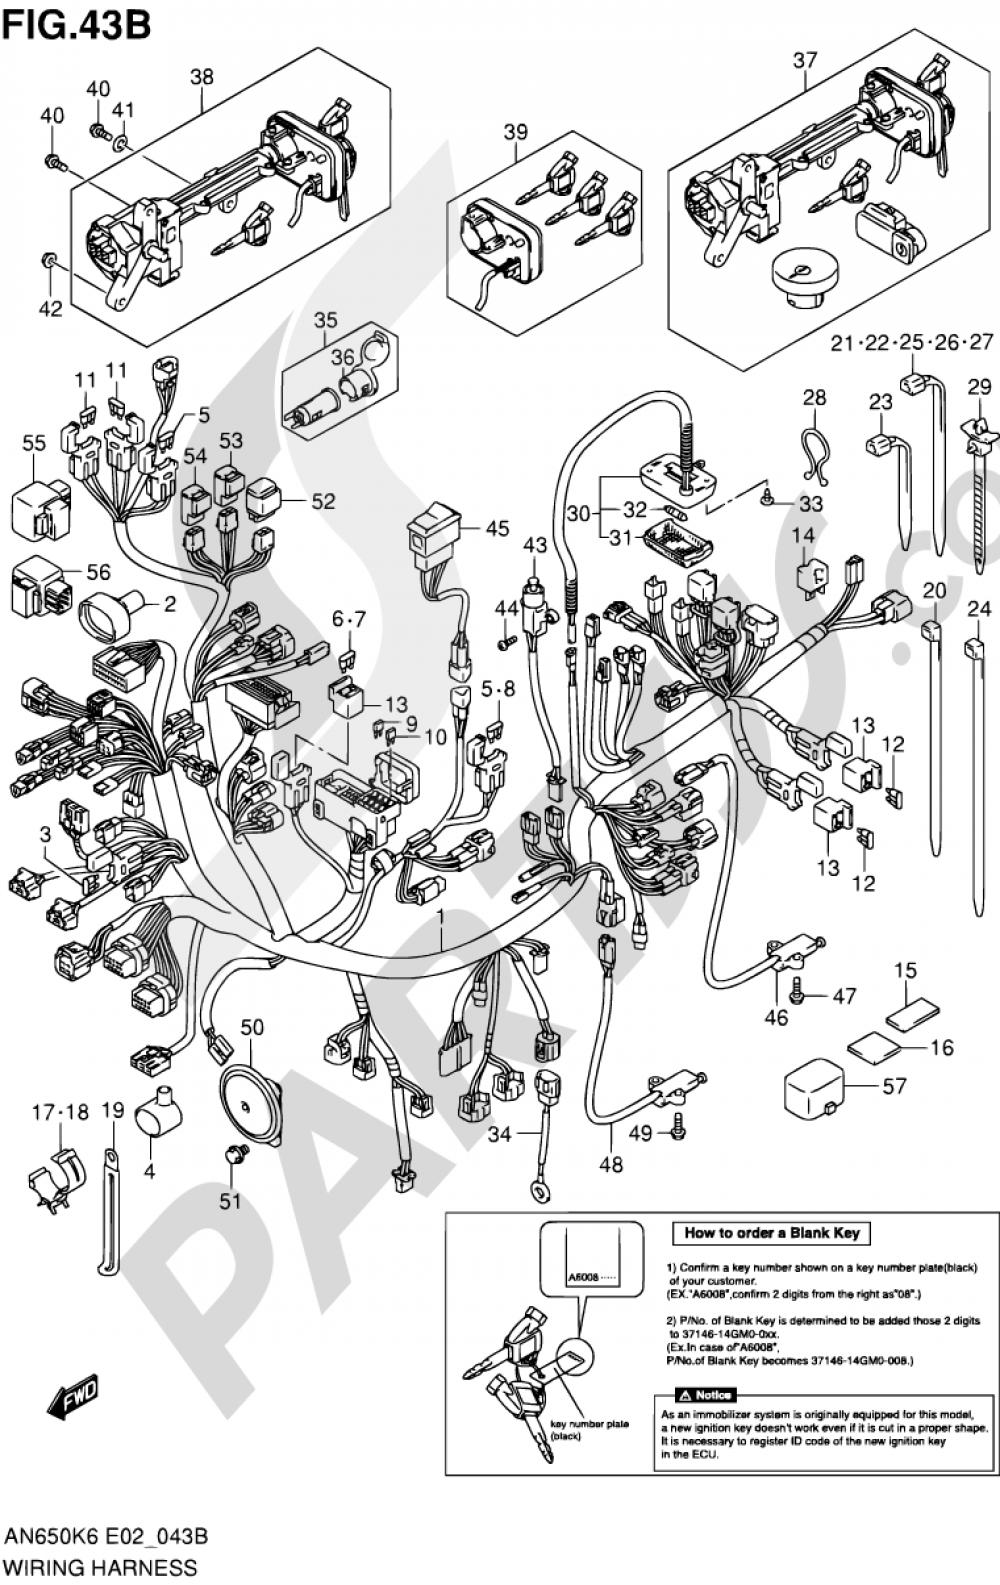 43B - WIRING HARNESS (AN650AK9/AL0 E02/E19/P37) Suzuki BURGMAN AN650A 2006